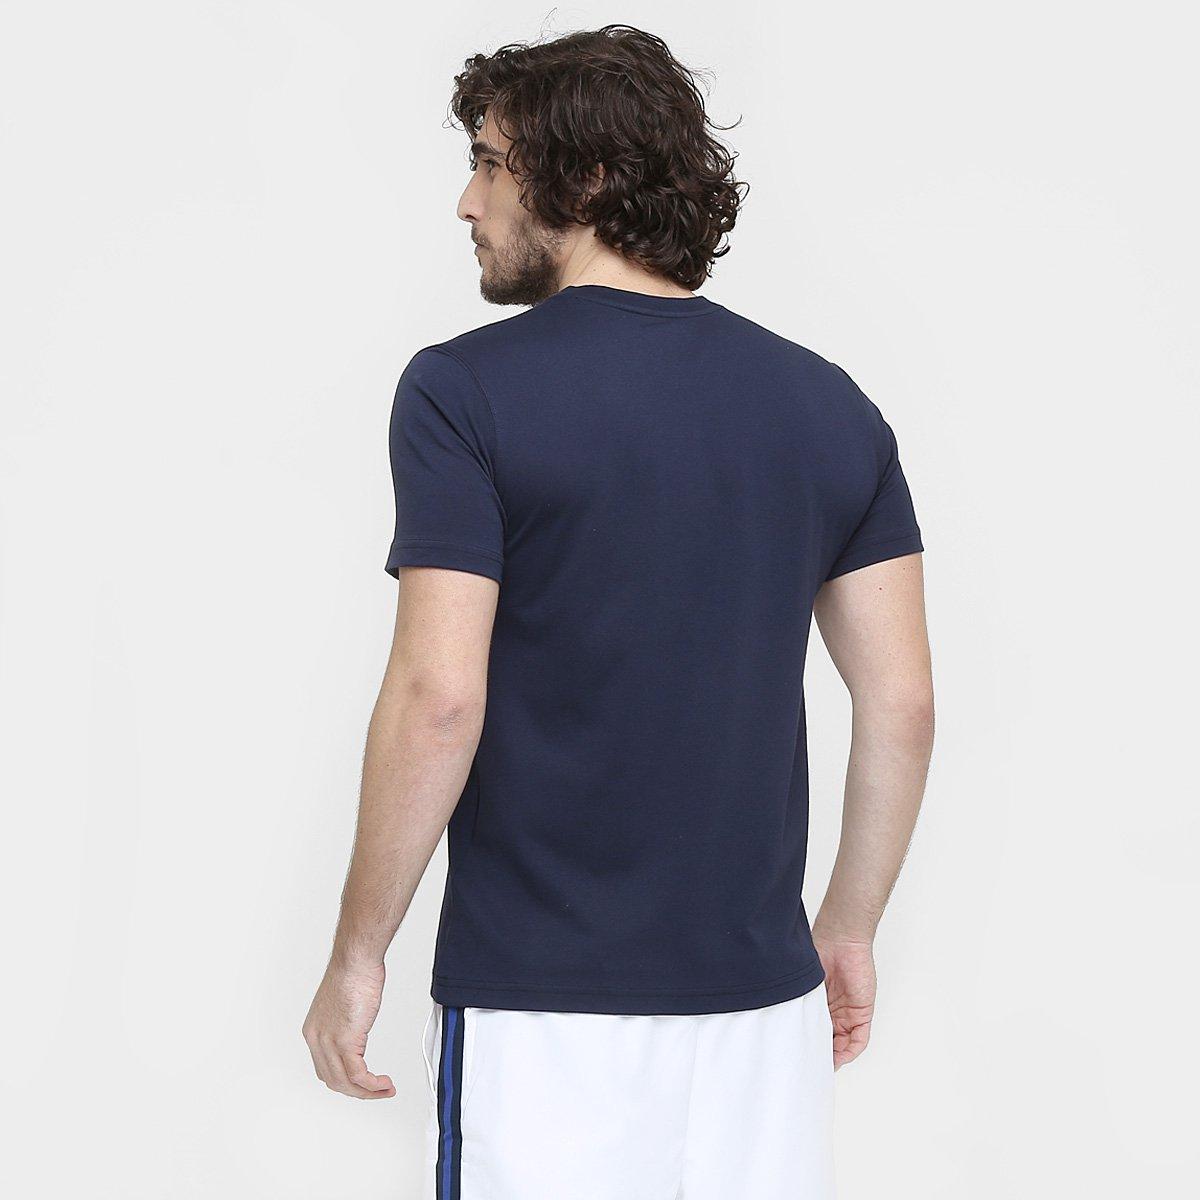 Camiseta Lacoste Gola Careca  Camiseta Lacoste Gola Careca ... 858eaabaa466b